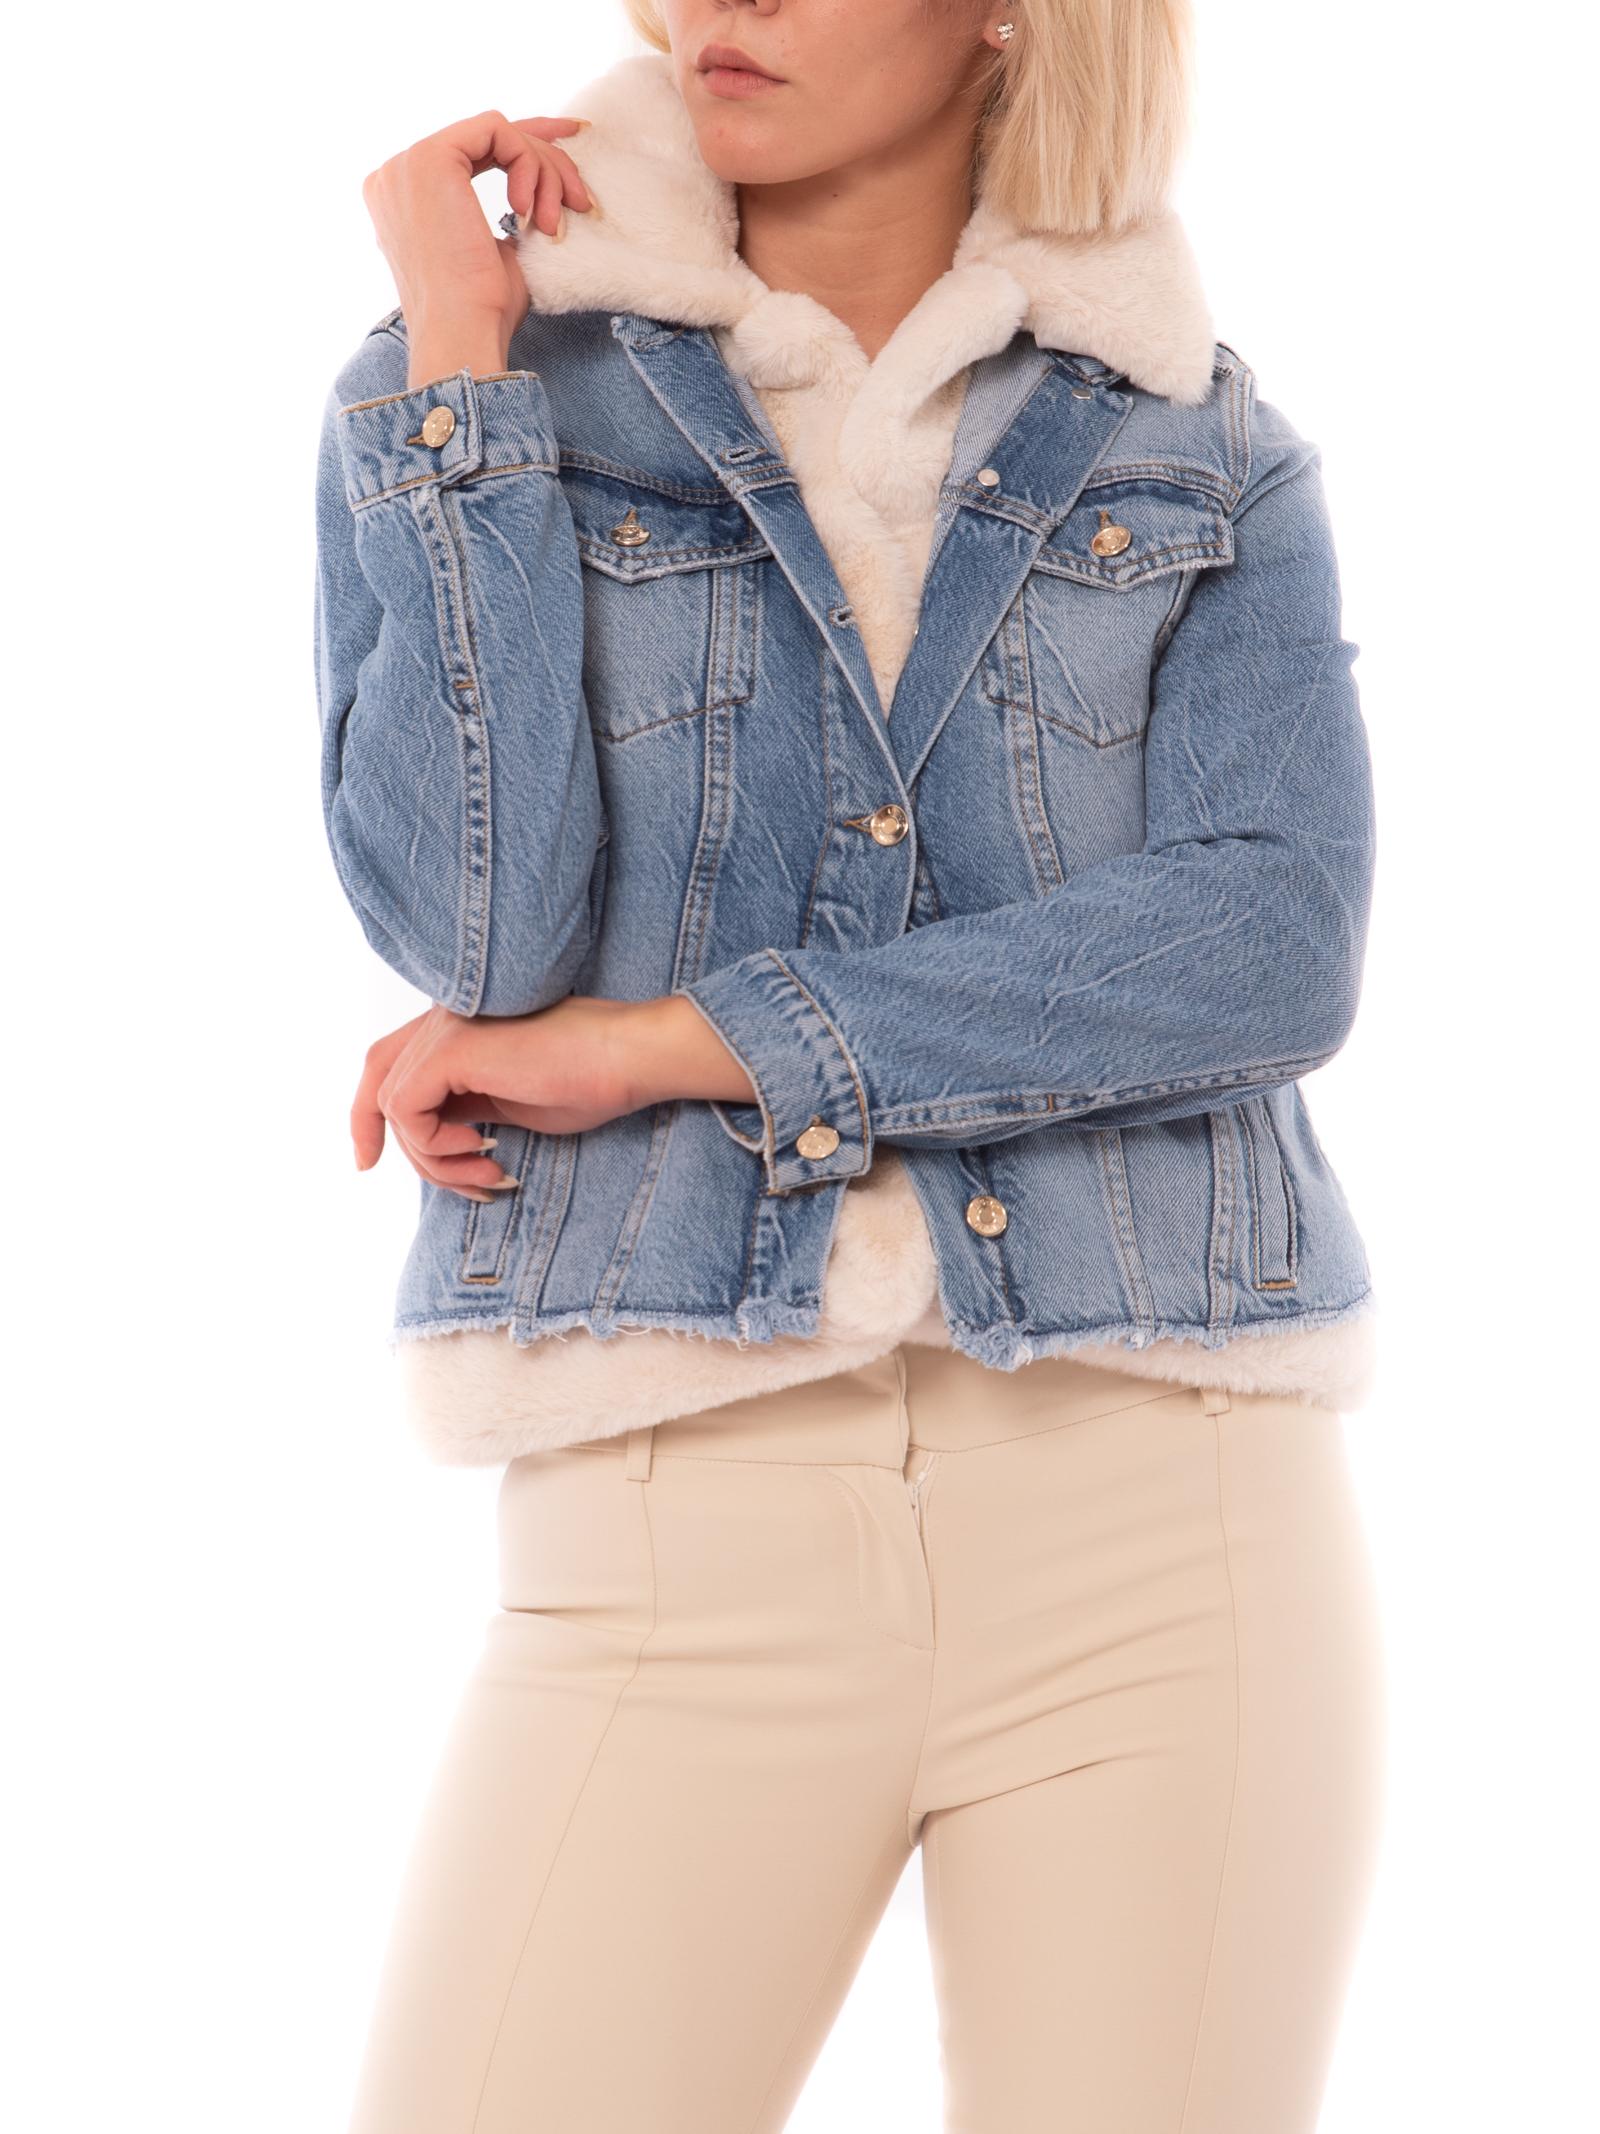 Giacca di jeans con gilet faux fur<BR/>